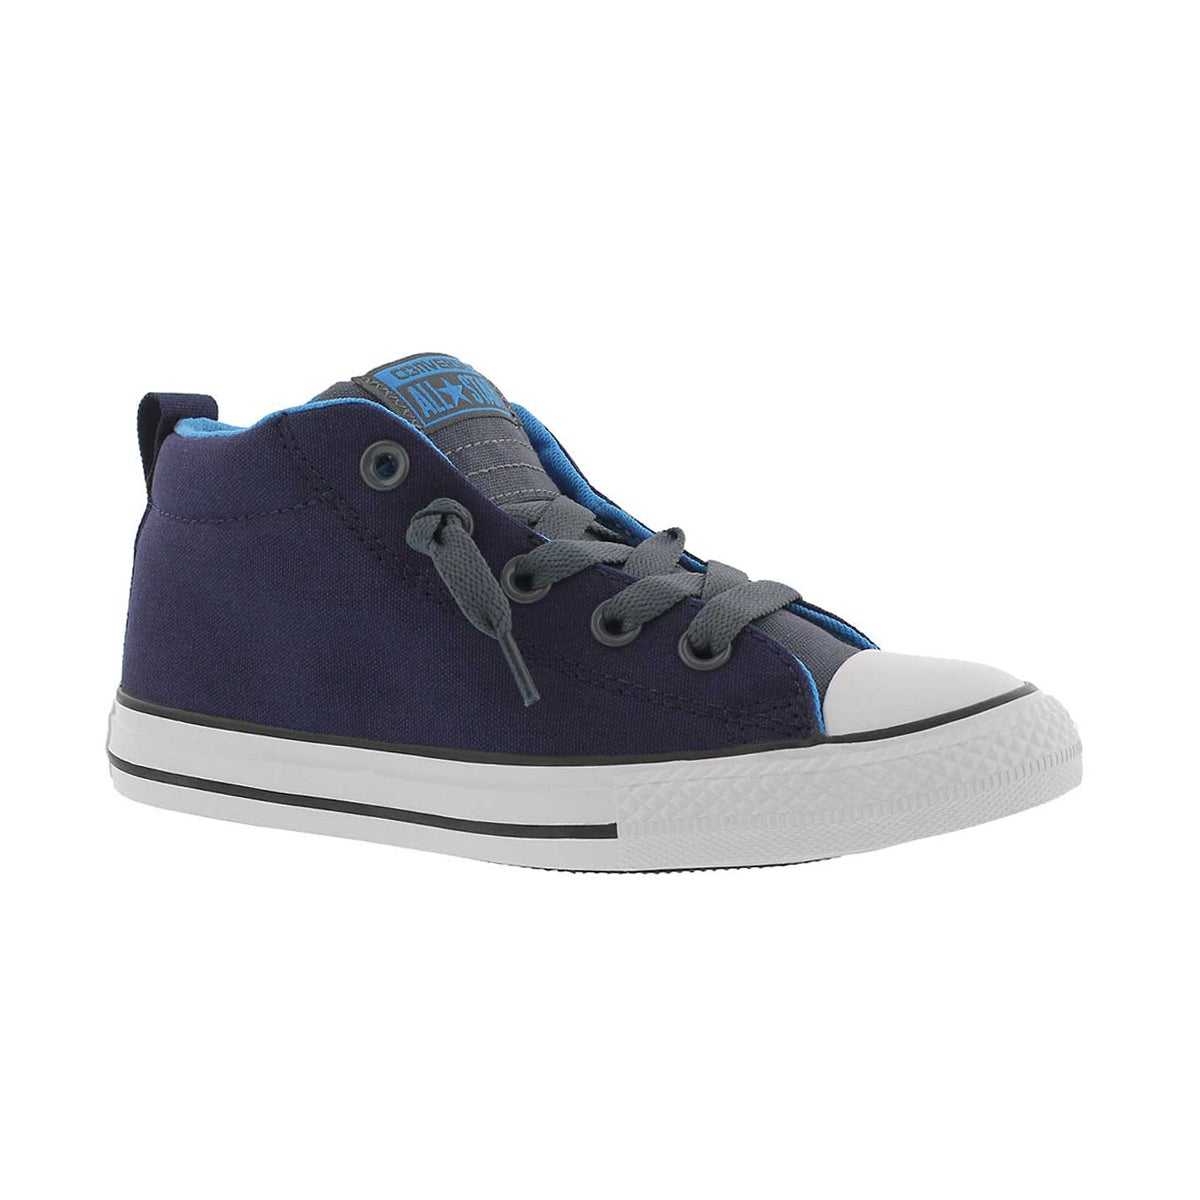 Boys' CT ALL STAR HI midnight indigo sneakers